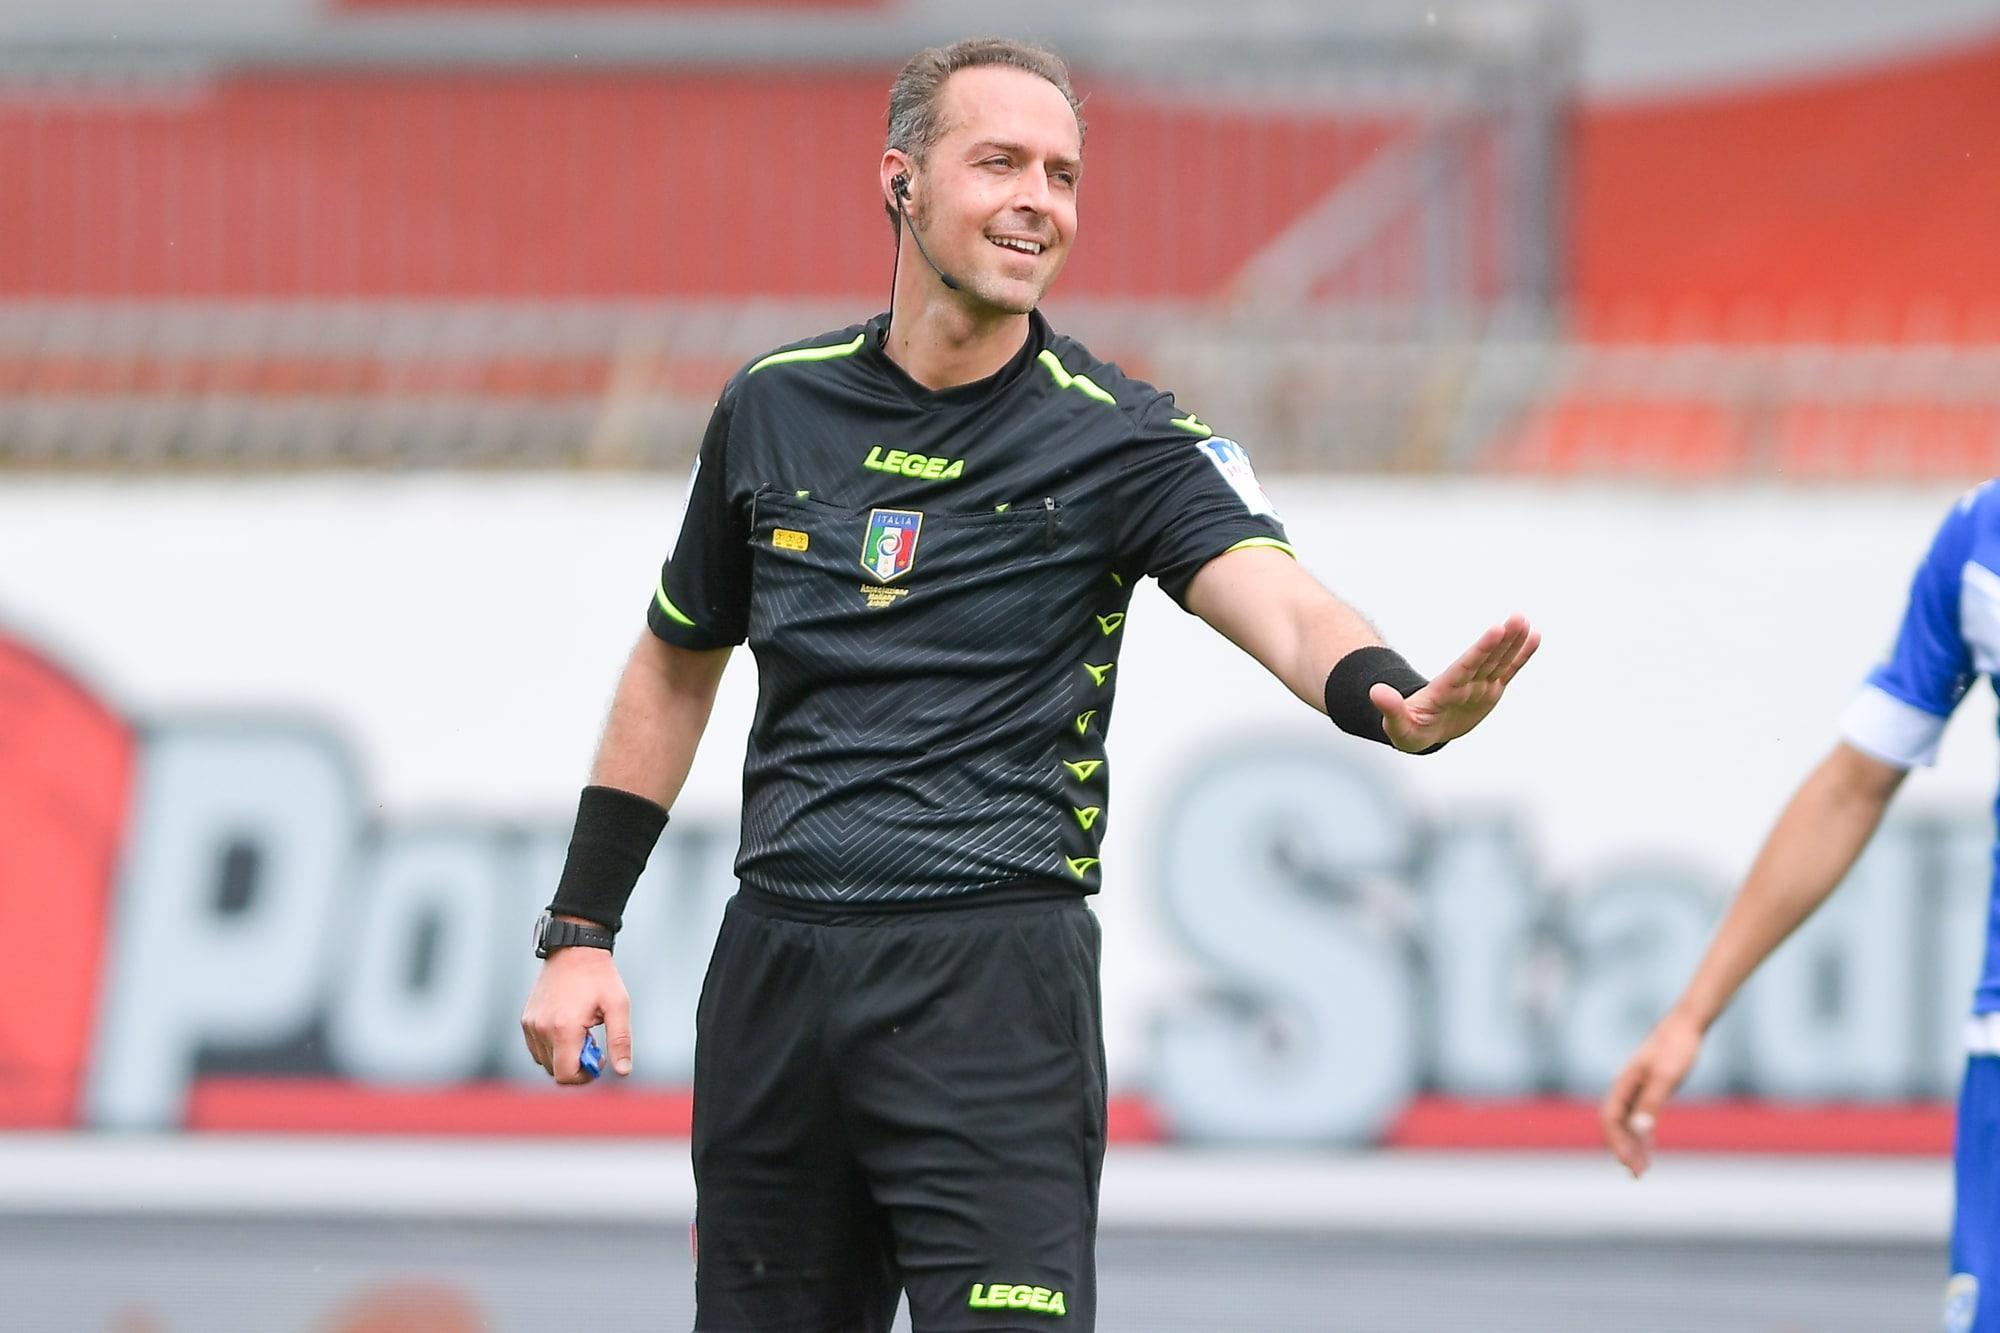 125412164 160481a0 6ff8 47ef af0c 53aaa5d80206 - Serie A, Roma-Lazio: dirige Pairetto. Calvarese per Juve-Inter